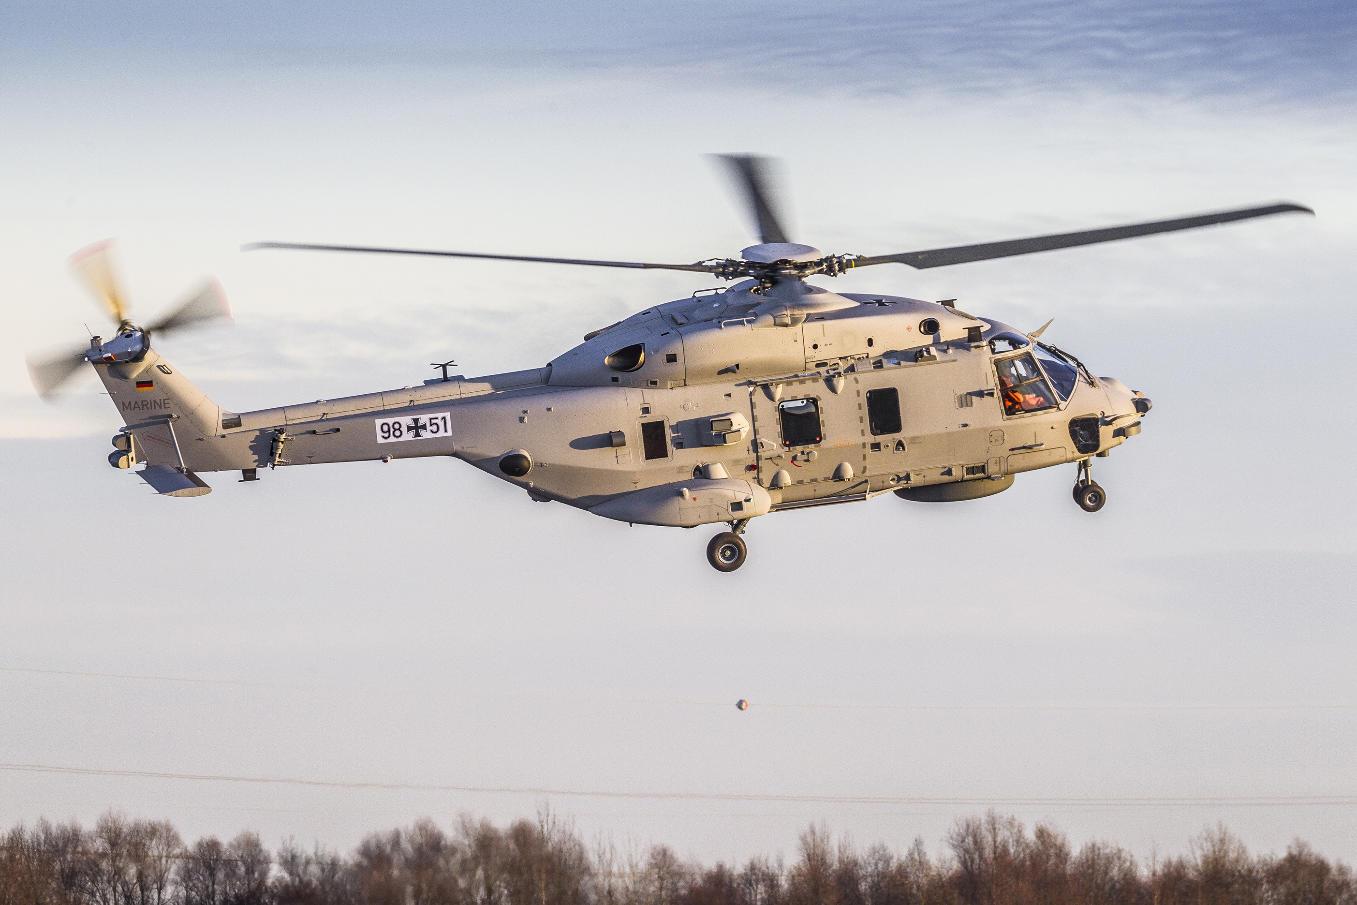 German Navy NH90 Sea Lion makes maiden flight